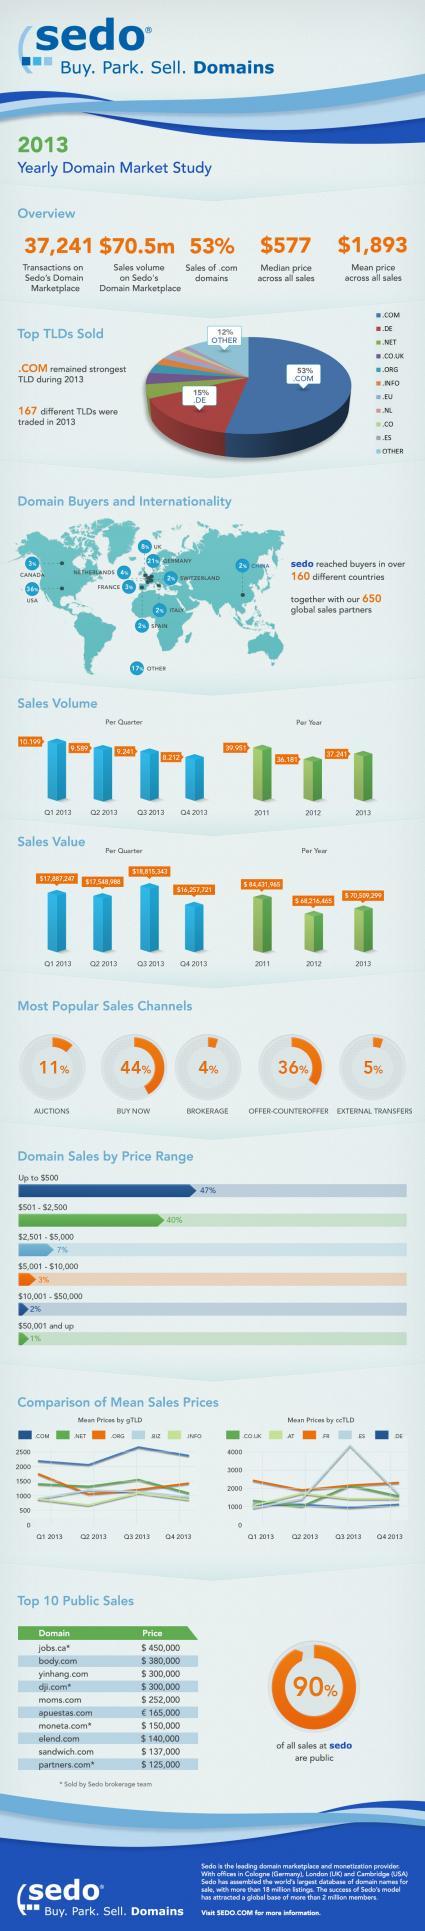 "Sedos Infografik zum Domainhandel in 2013 / Bild: ""obs/Sedo GmbH/Sedo.com"""